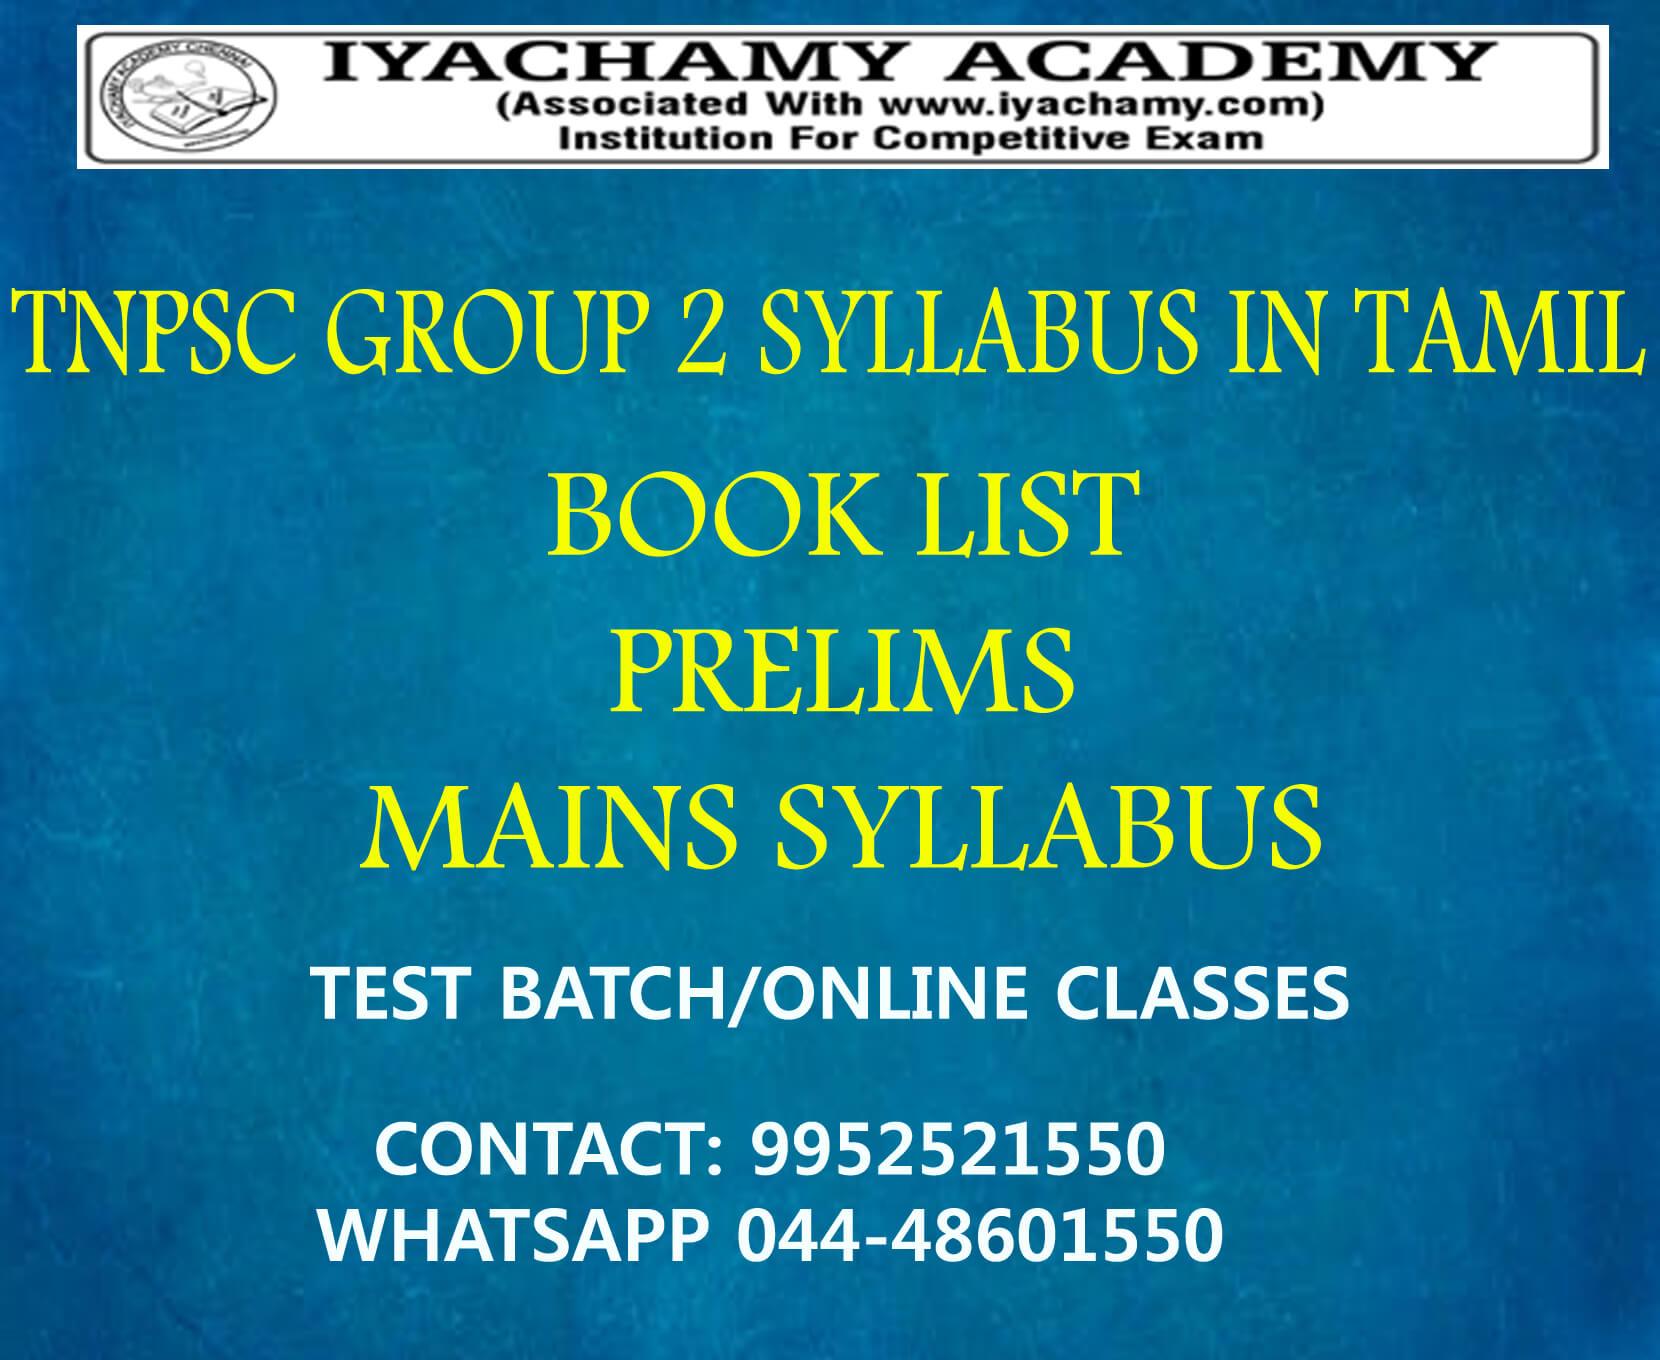 TNPSC | Iyachamy Academy